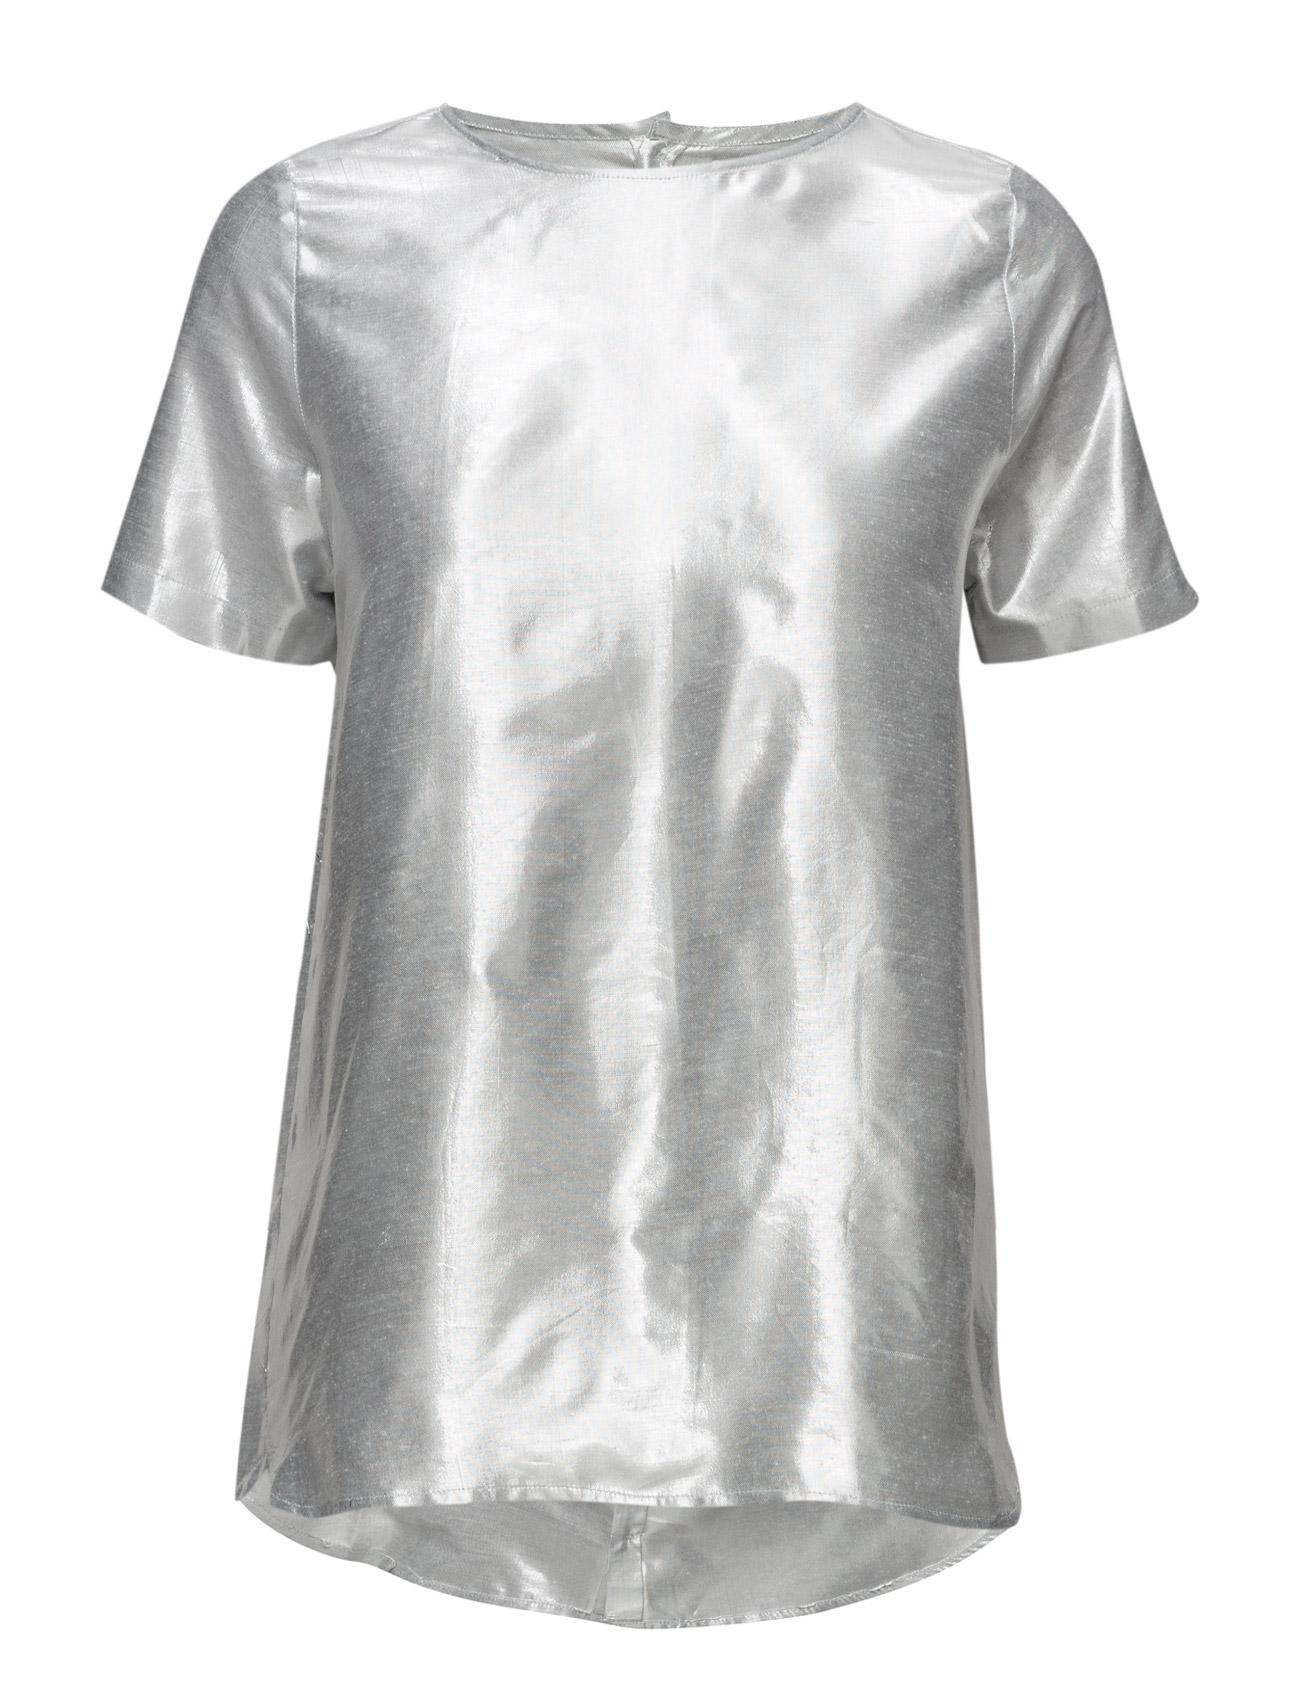 Lamé Tee Shirt Cathrine Hammel Kortærmede til Damer i